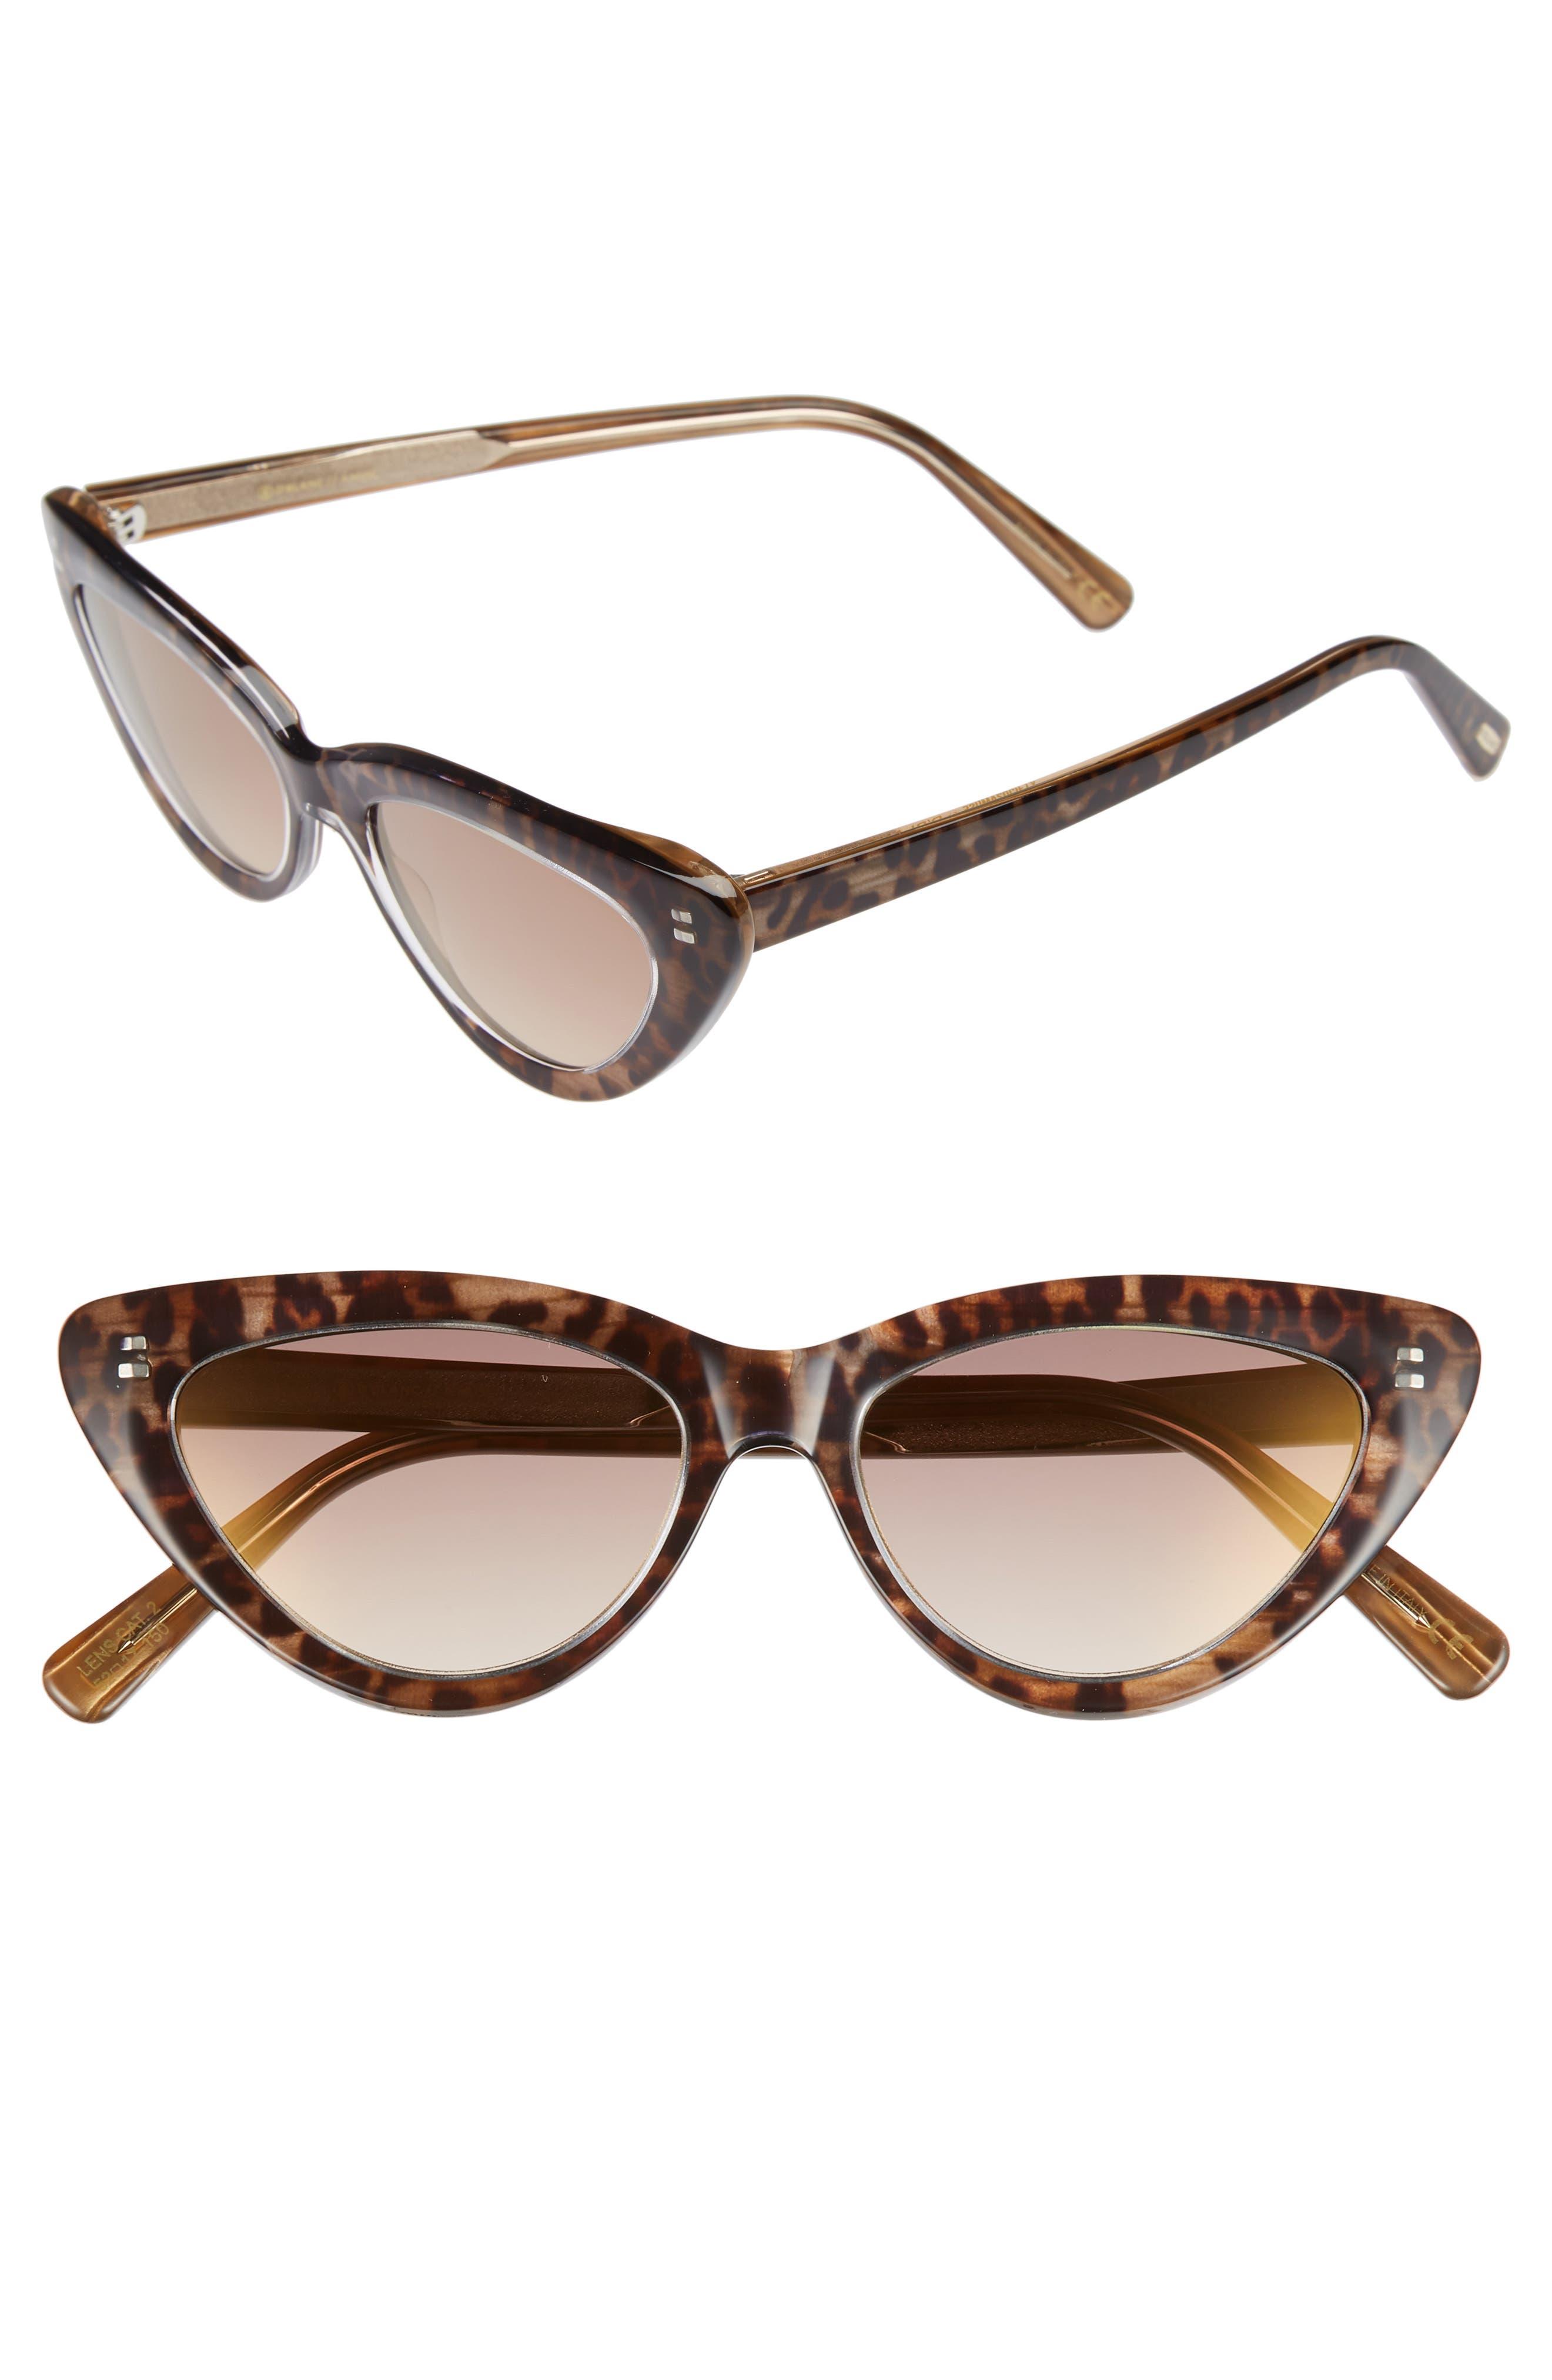 D'BLANC A-Muse 52mm Sunglasses,                             Main thumbnail 1, color,                             Cheetah